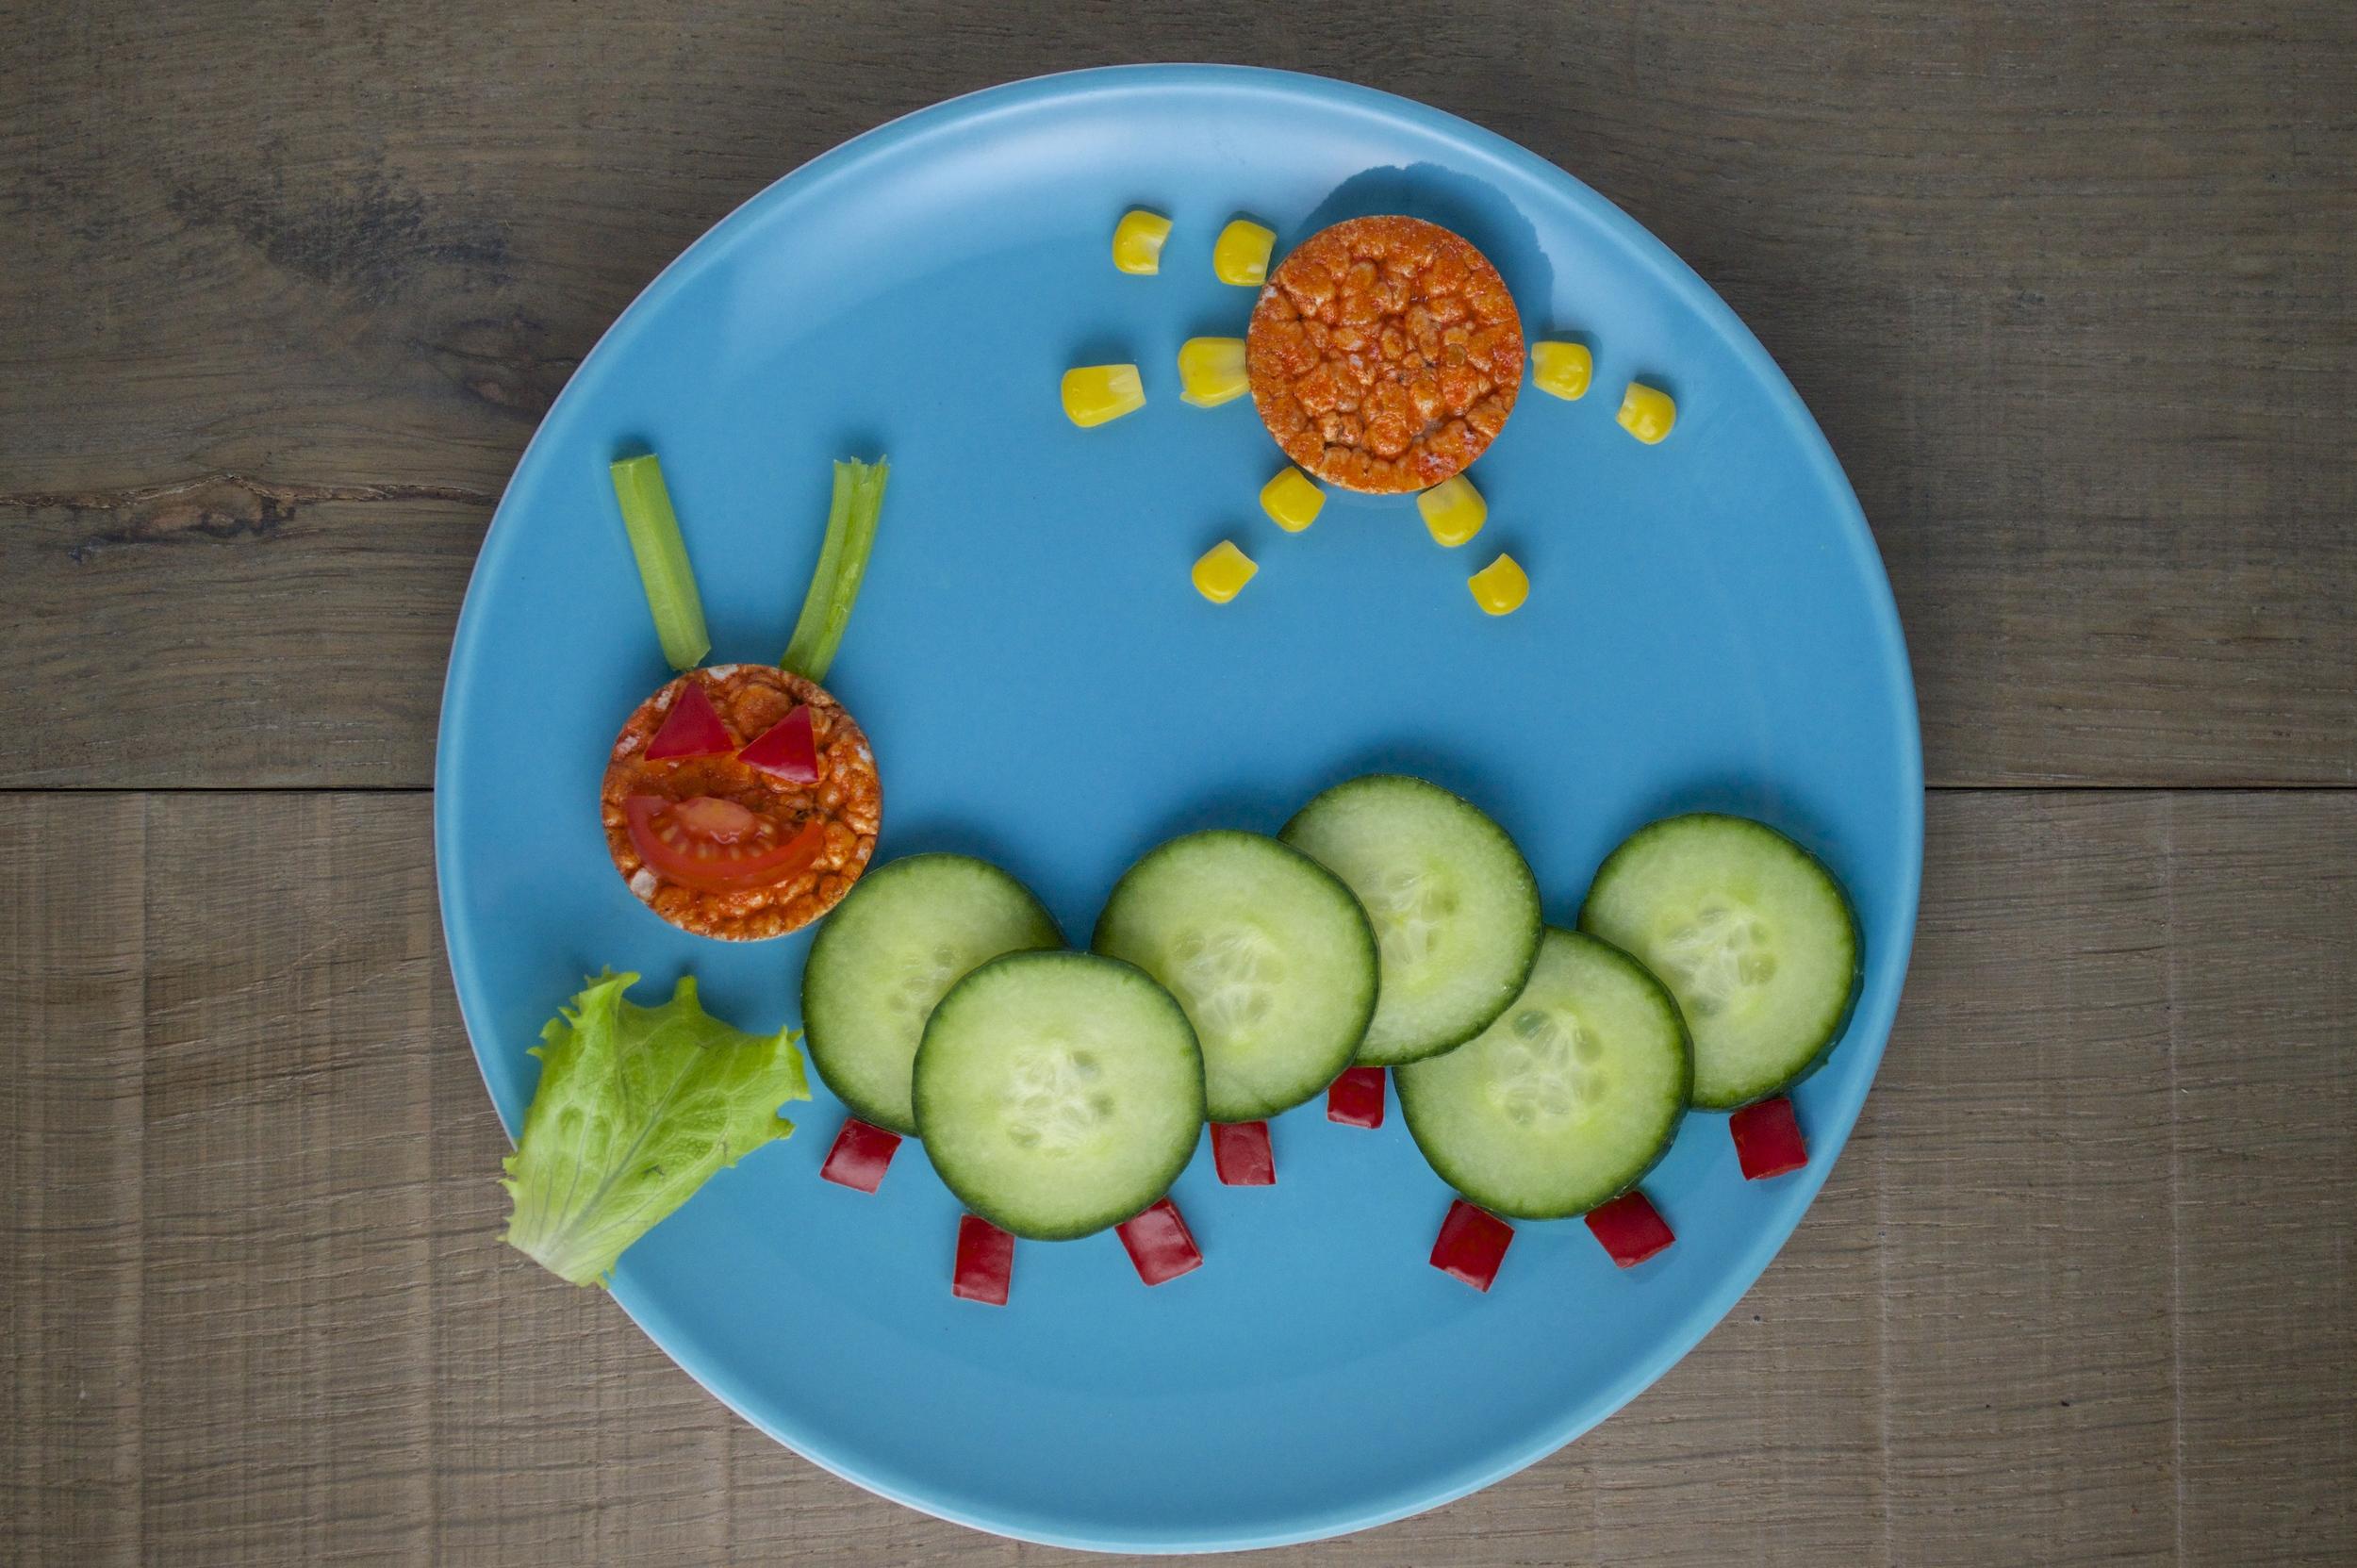 Caterpillar Fun Plate by Organix